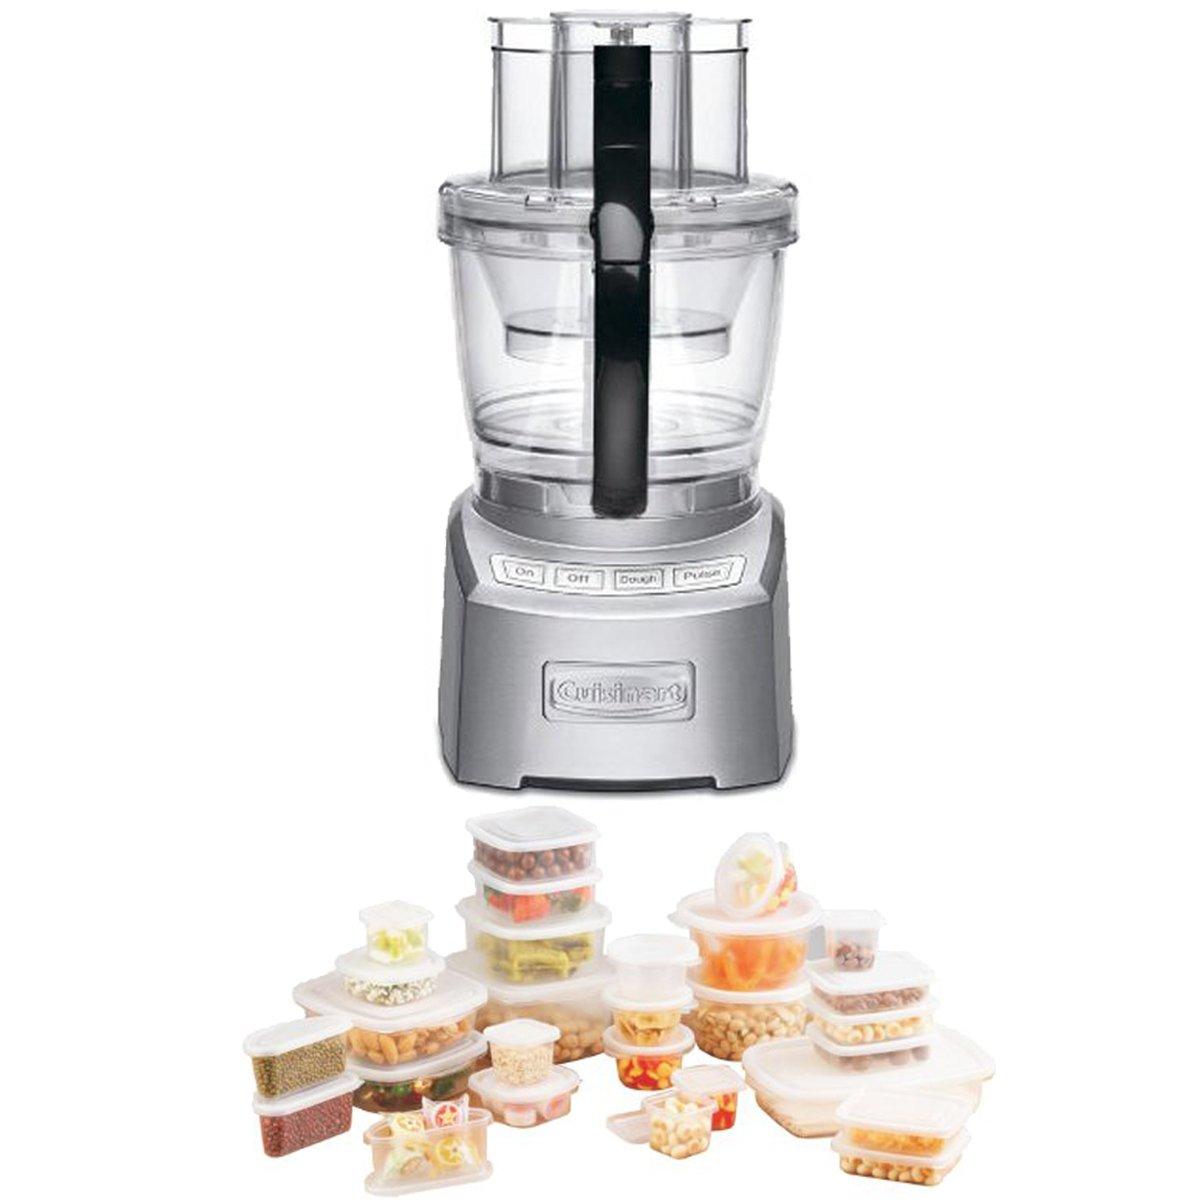 Cuisinart FP-14DC Elite Collection 14-cup Die Cast Food Processor And Storage Case Bundle